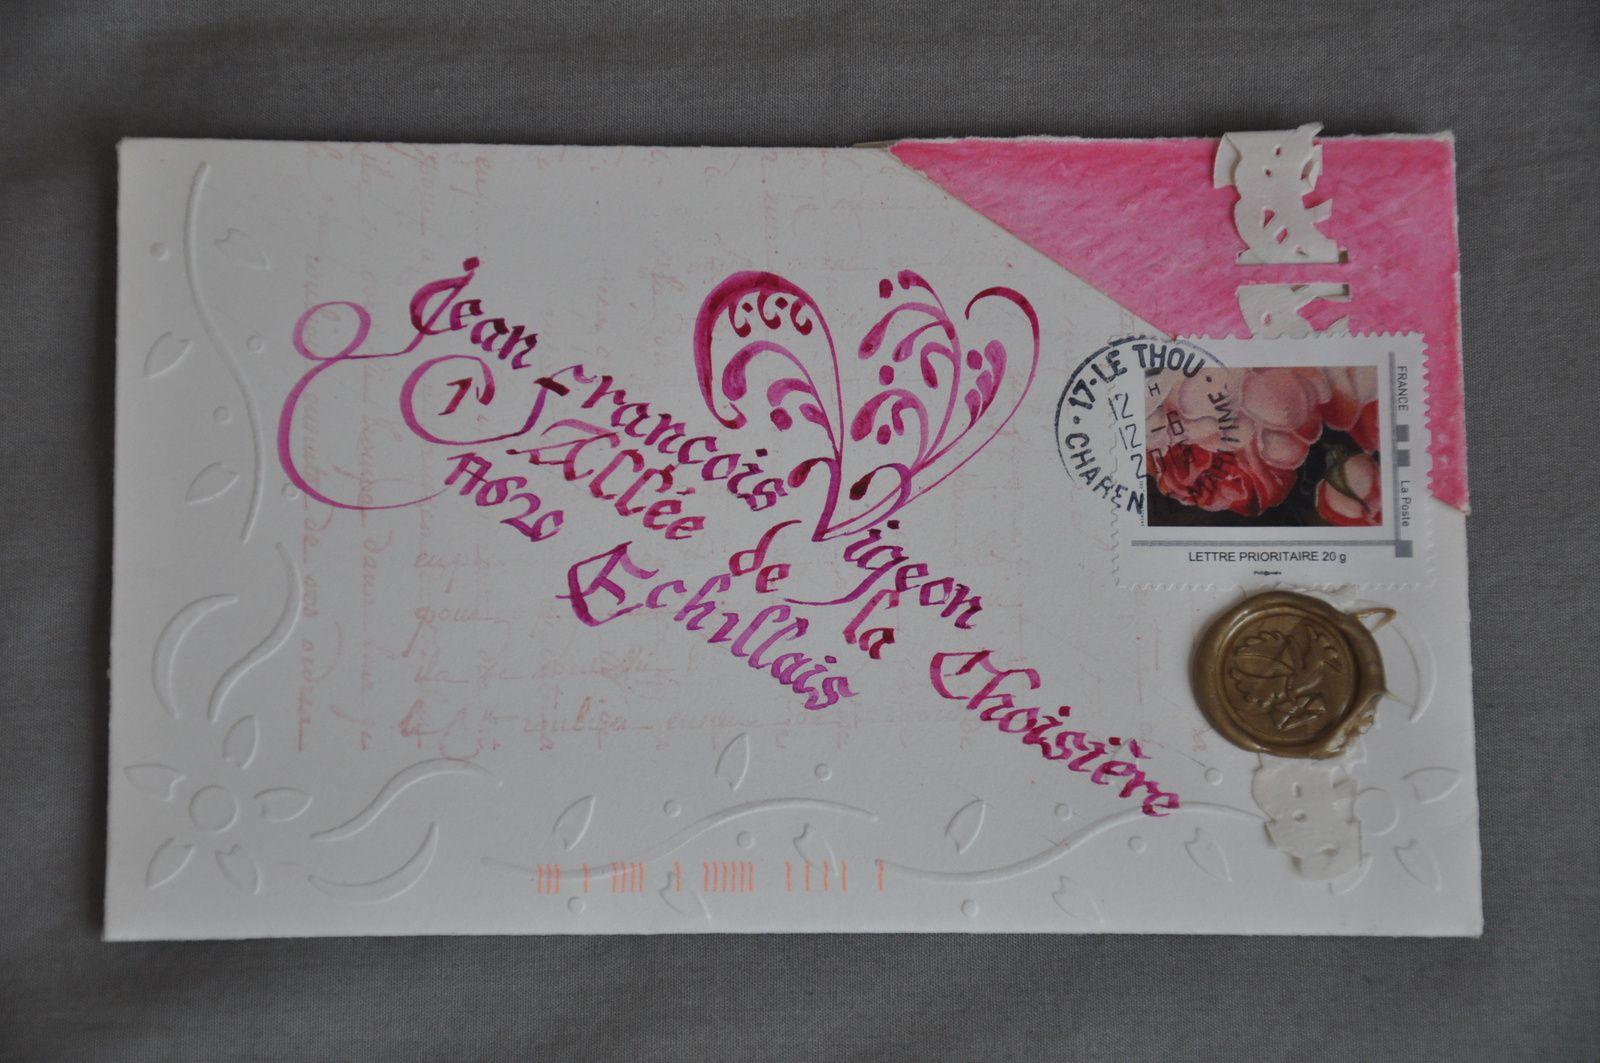 Cette superbe enveloppe est de Corinne Vitasse! BRAVO l'artiste et MERCI!